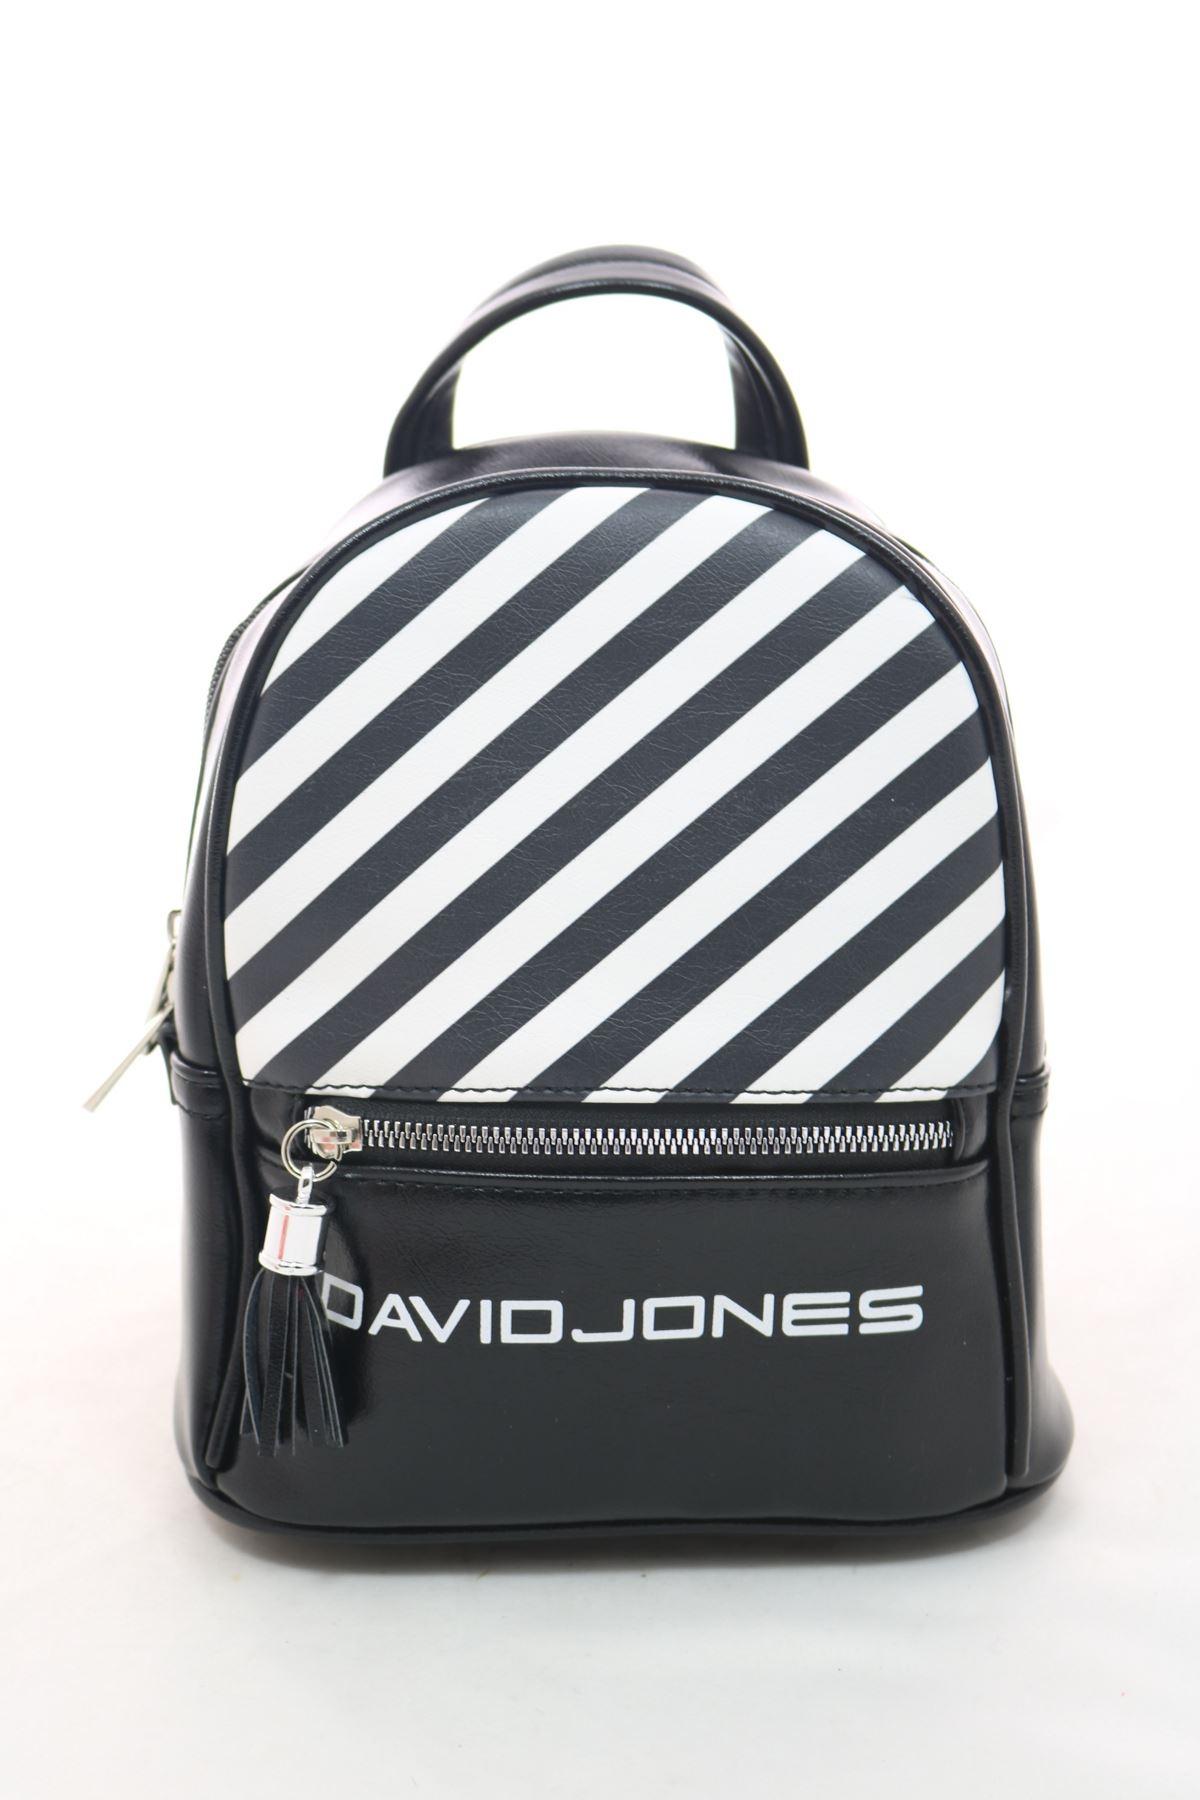 Рюкзак David Jones 5965-4 оптом